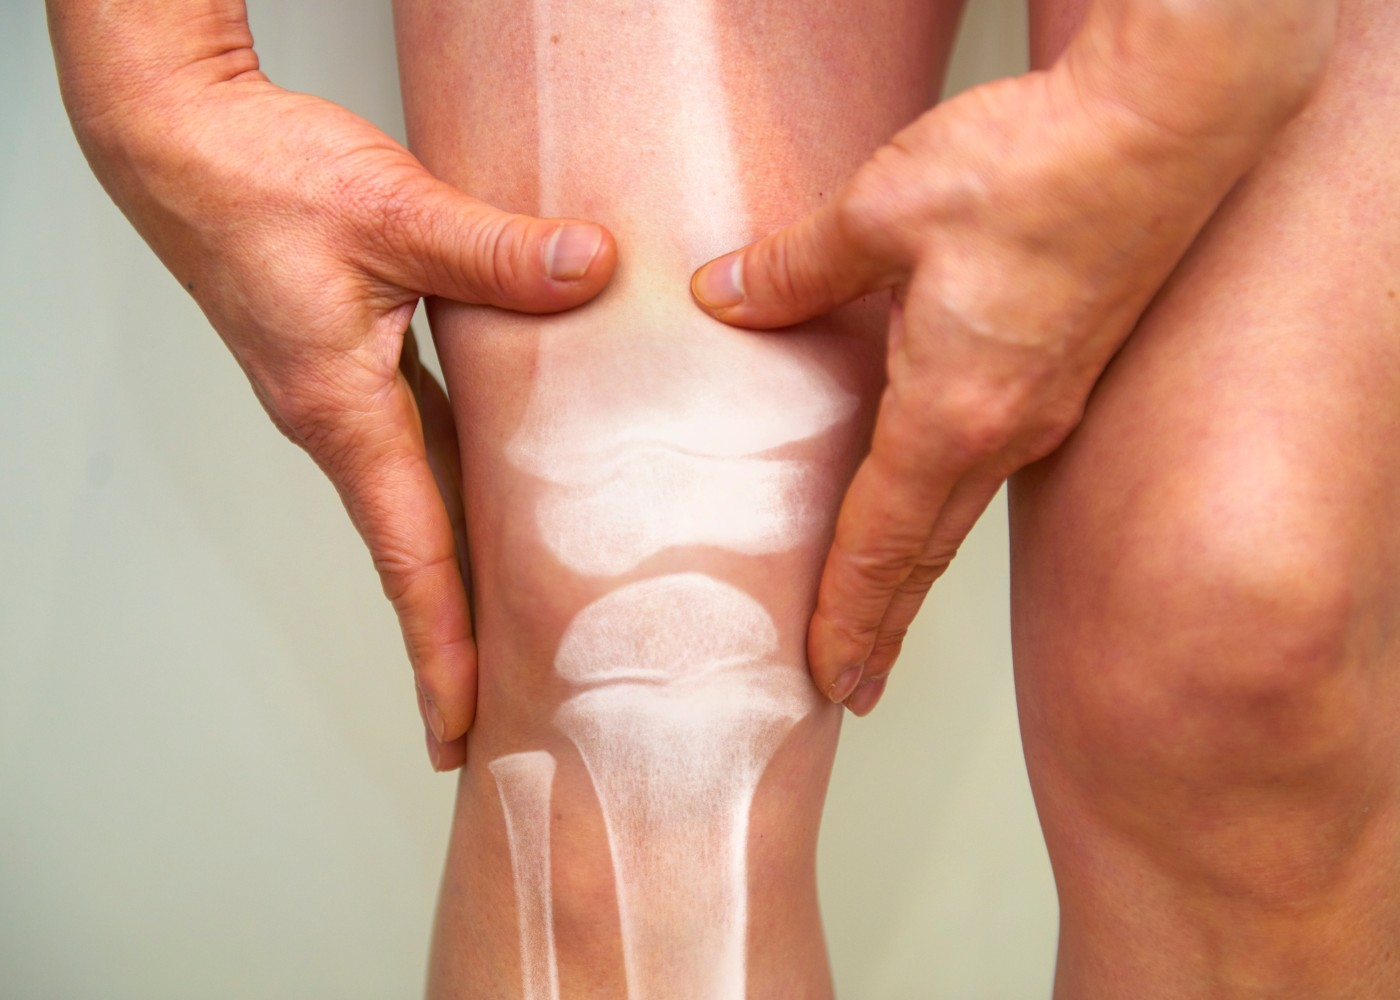 Radiografia de artrite reumatoide